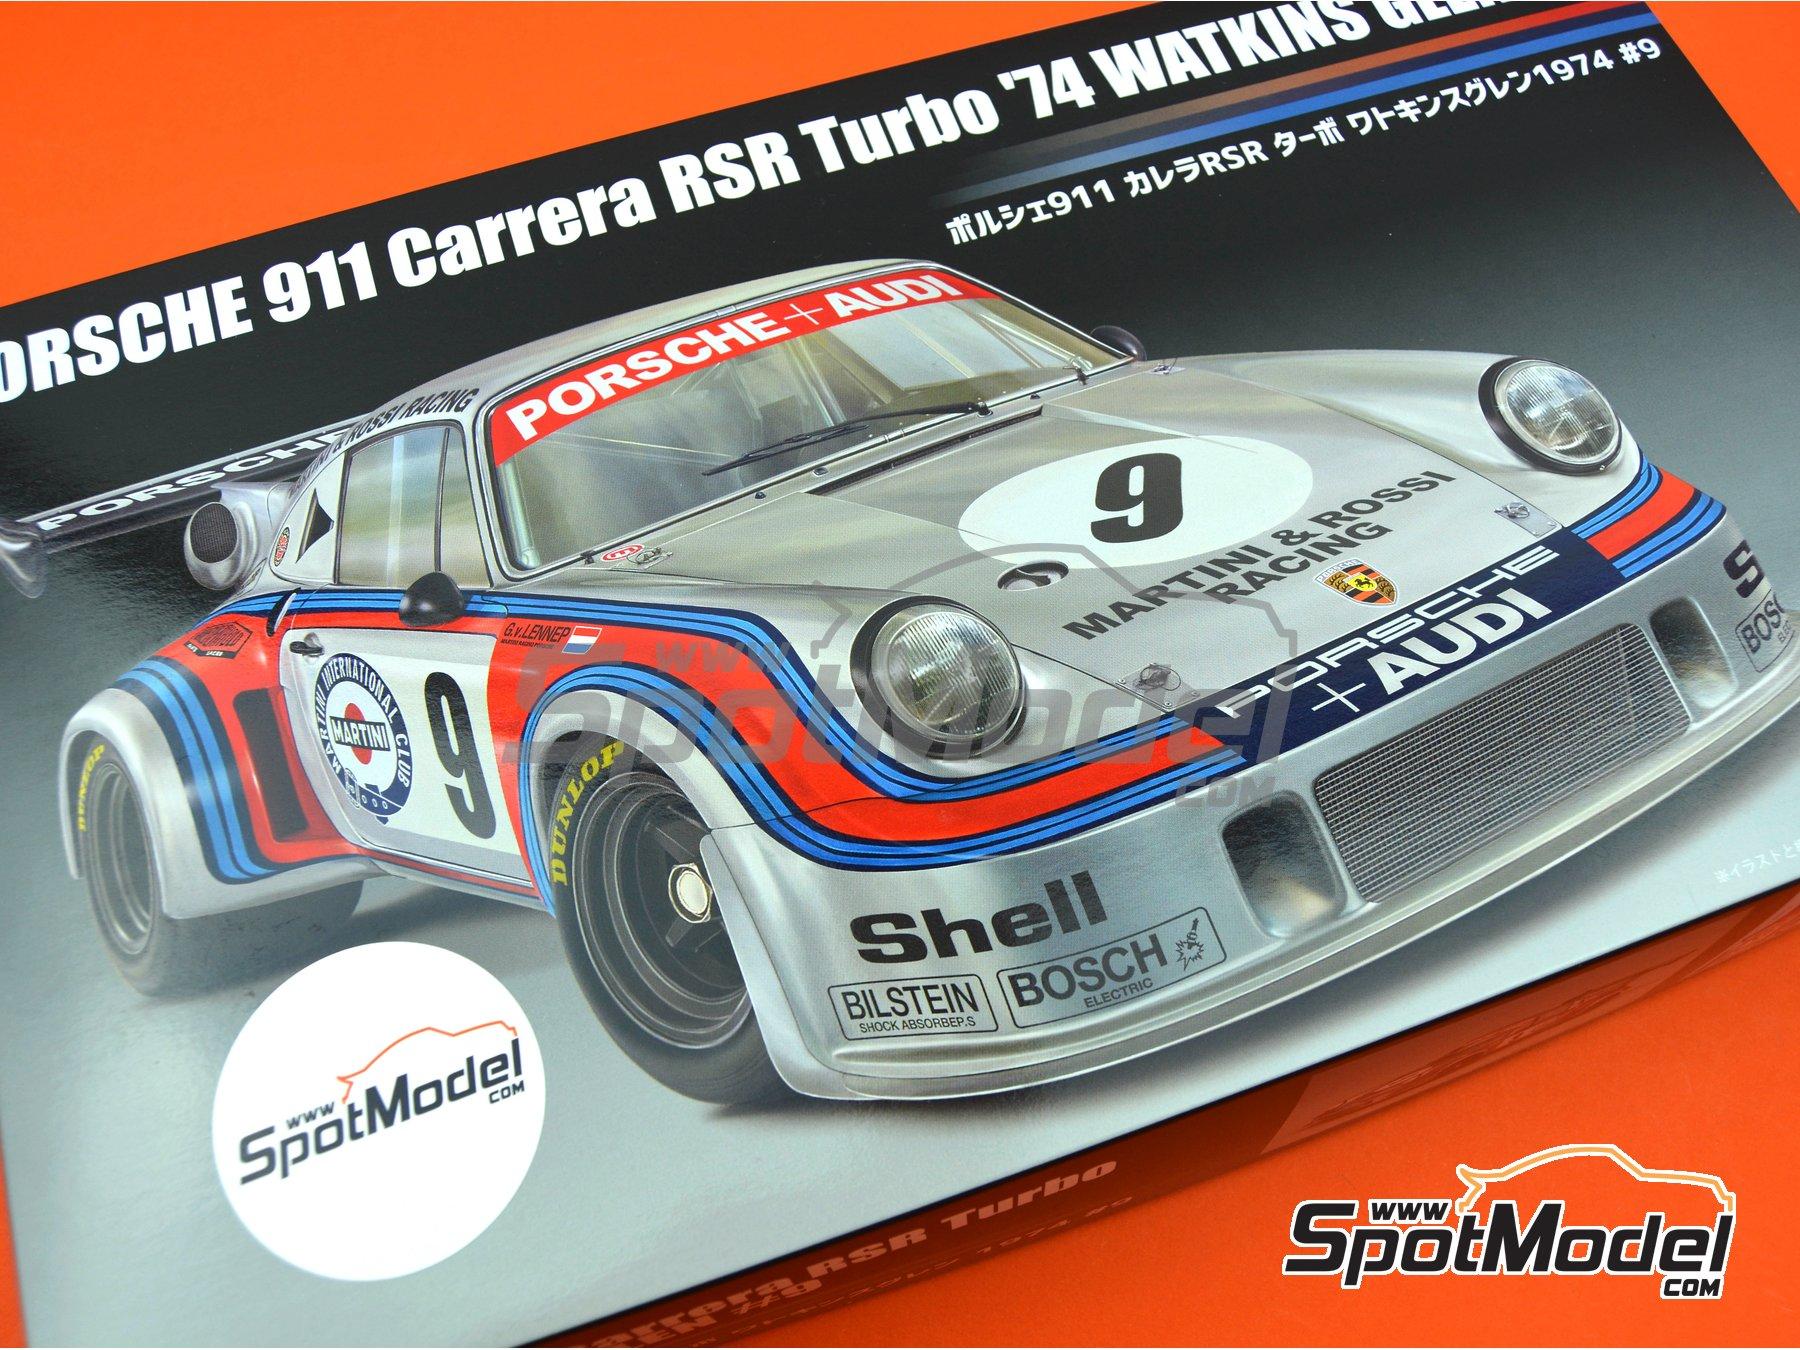 Image 18: Porsche 911 Carrera RSR Turbo Martini Rossi Porsche Audi - Watkins Glen 6 Hours 1974   Model car kit in 1/24 scale manufactured by Fujimi (ref.FJ126494, also 126494 and RS-99)